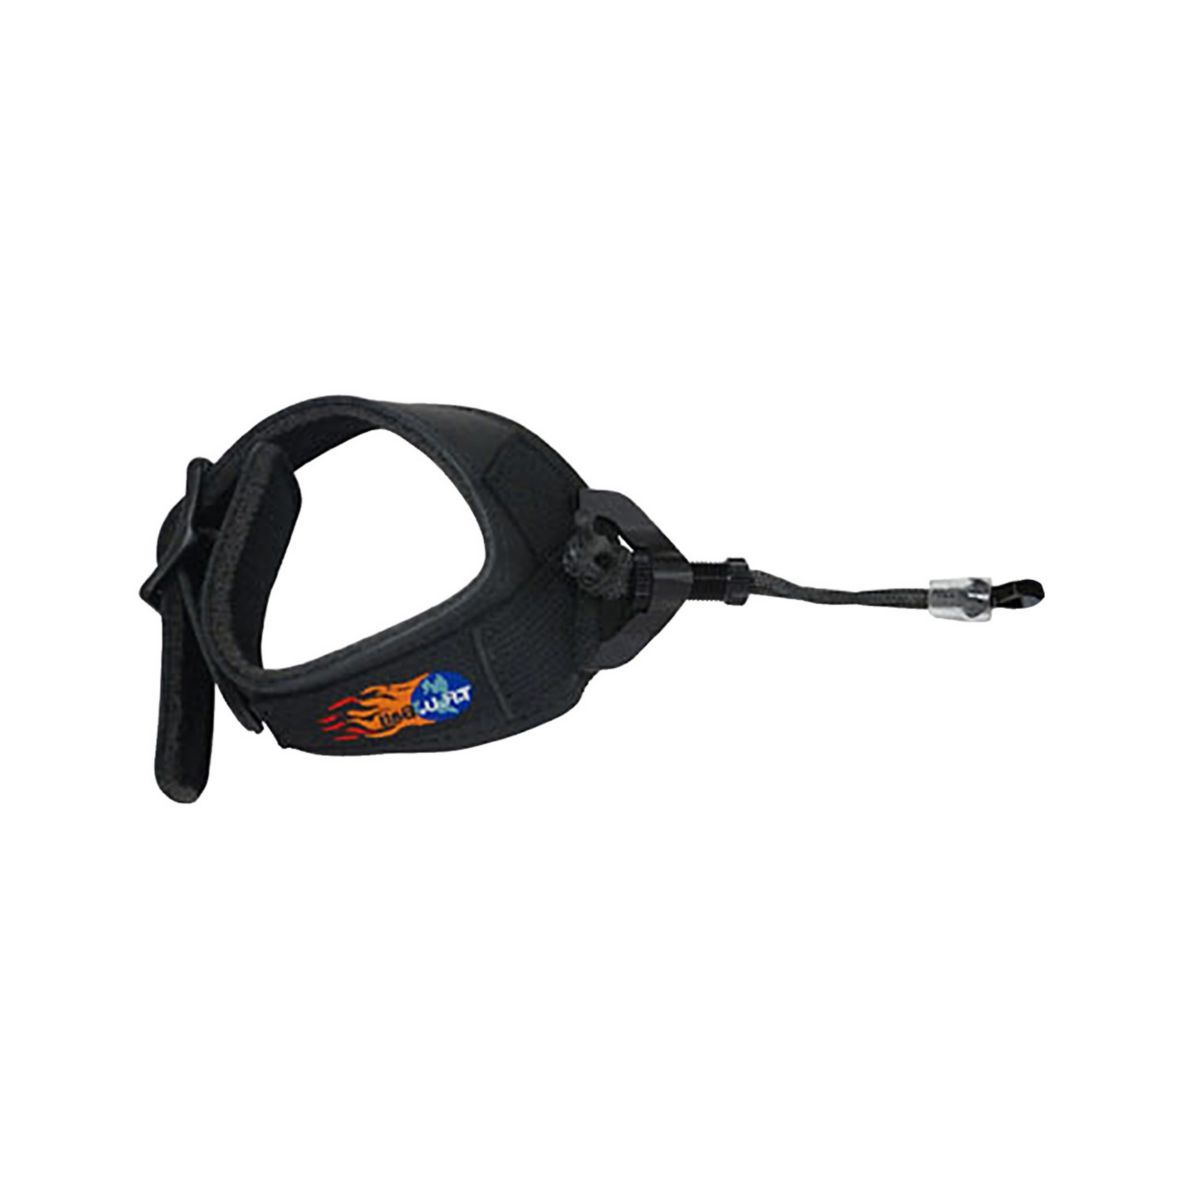 T.R.U. Ball V-Lock T-Handle Strap Large Buckle